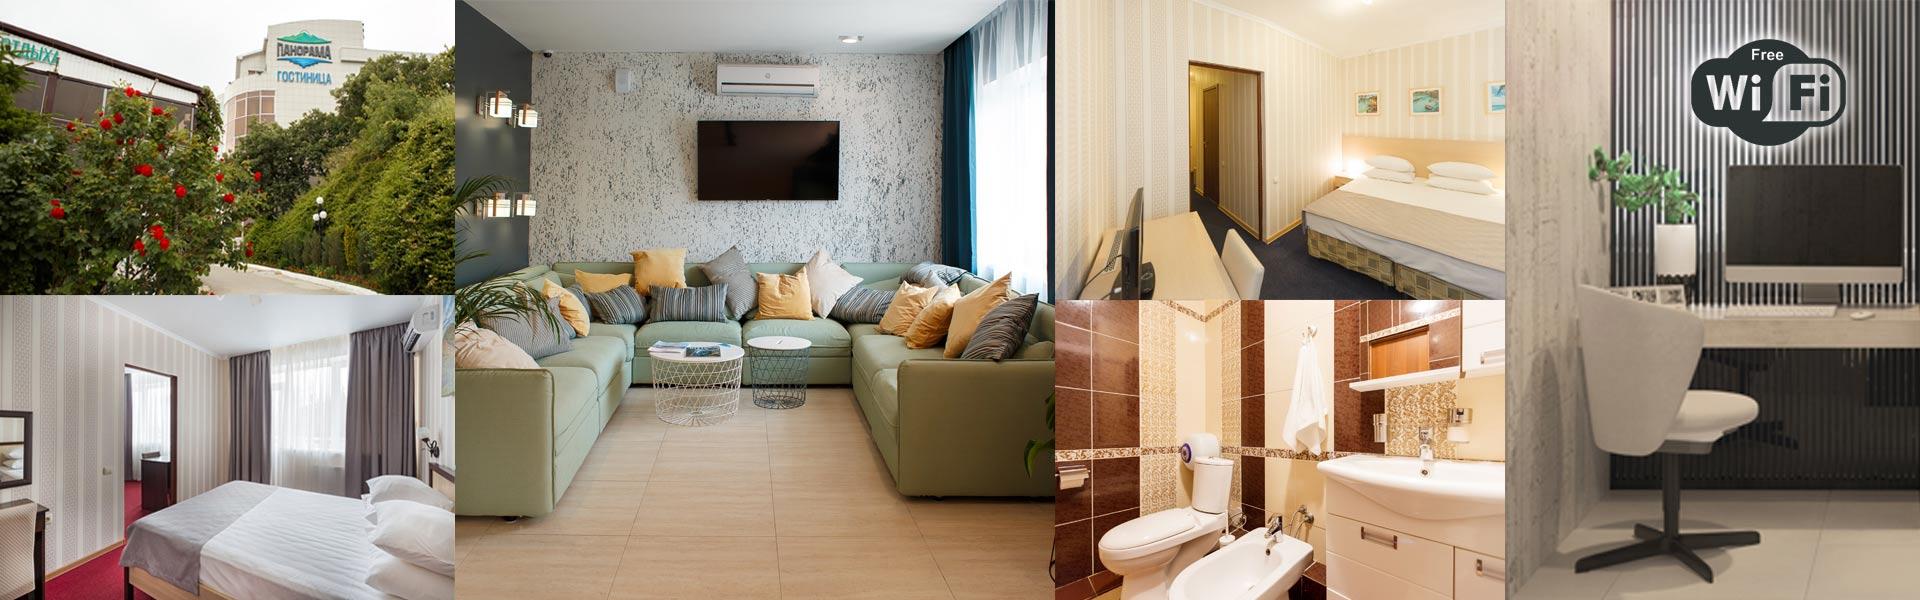 slider-hotel1